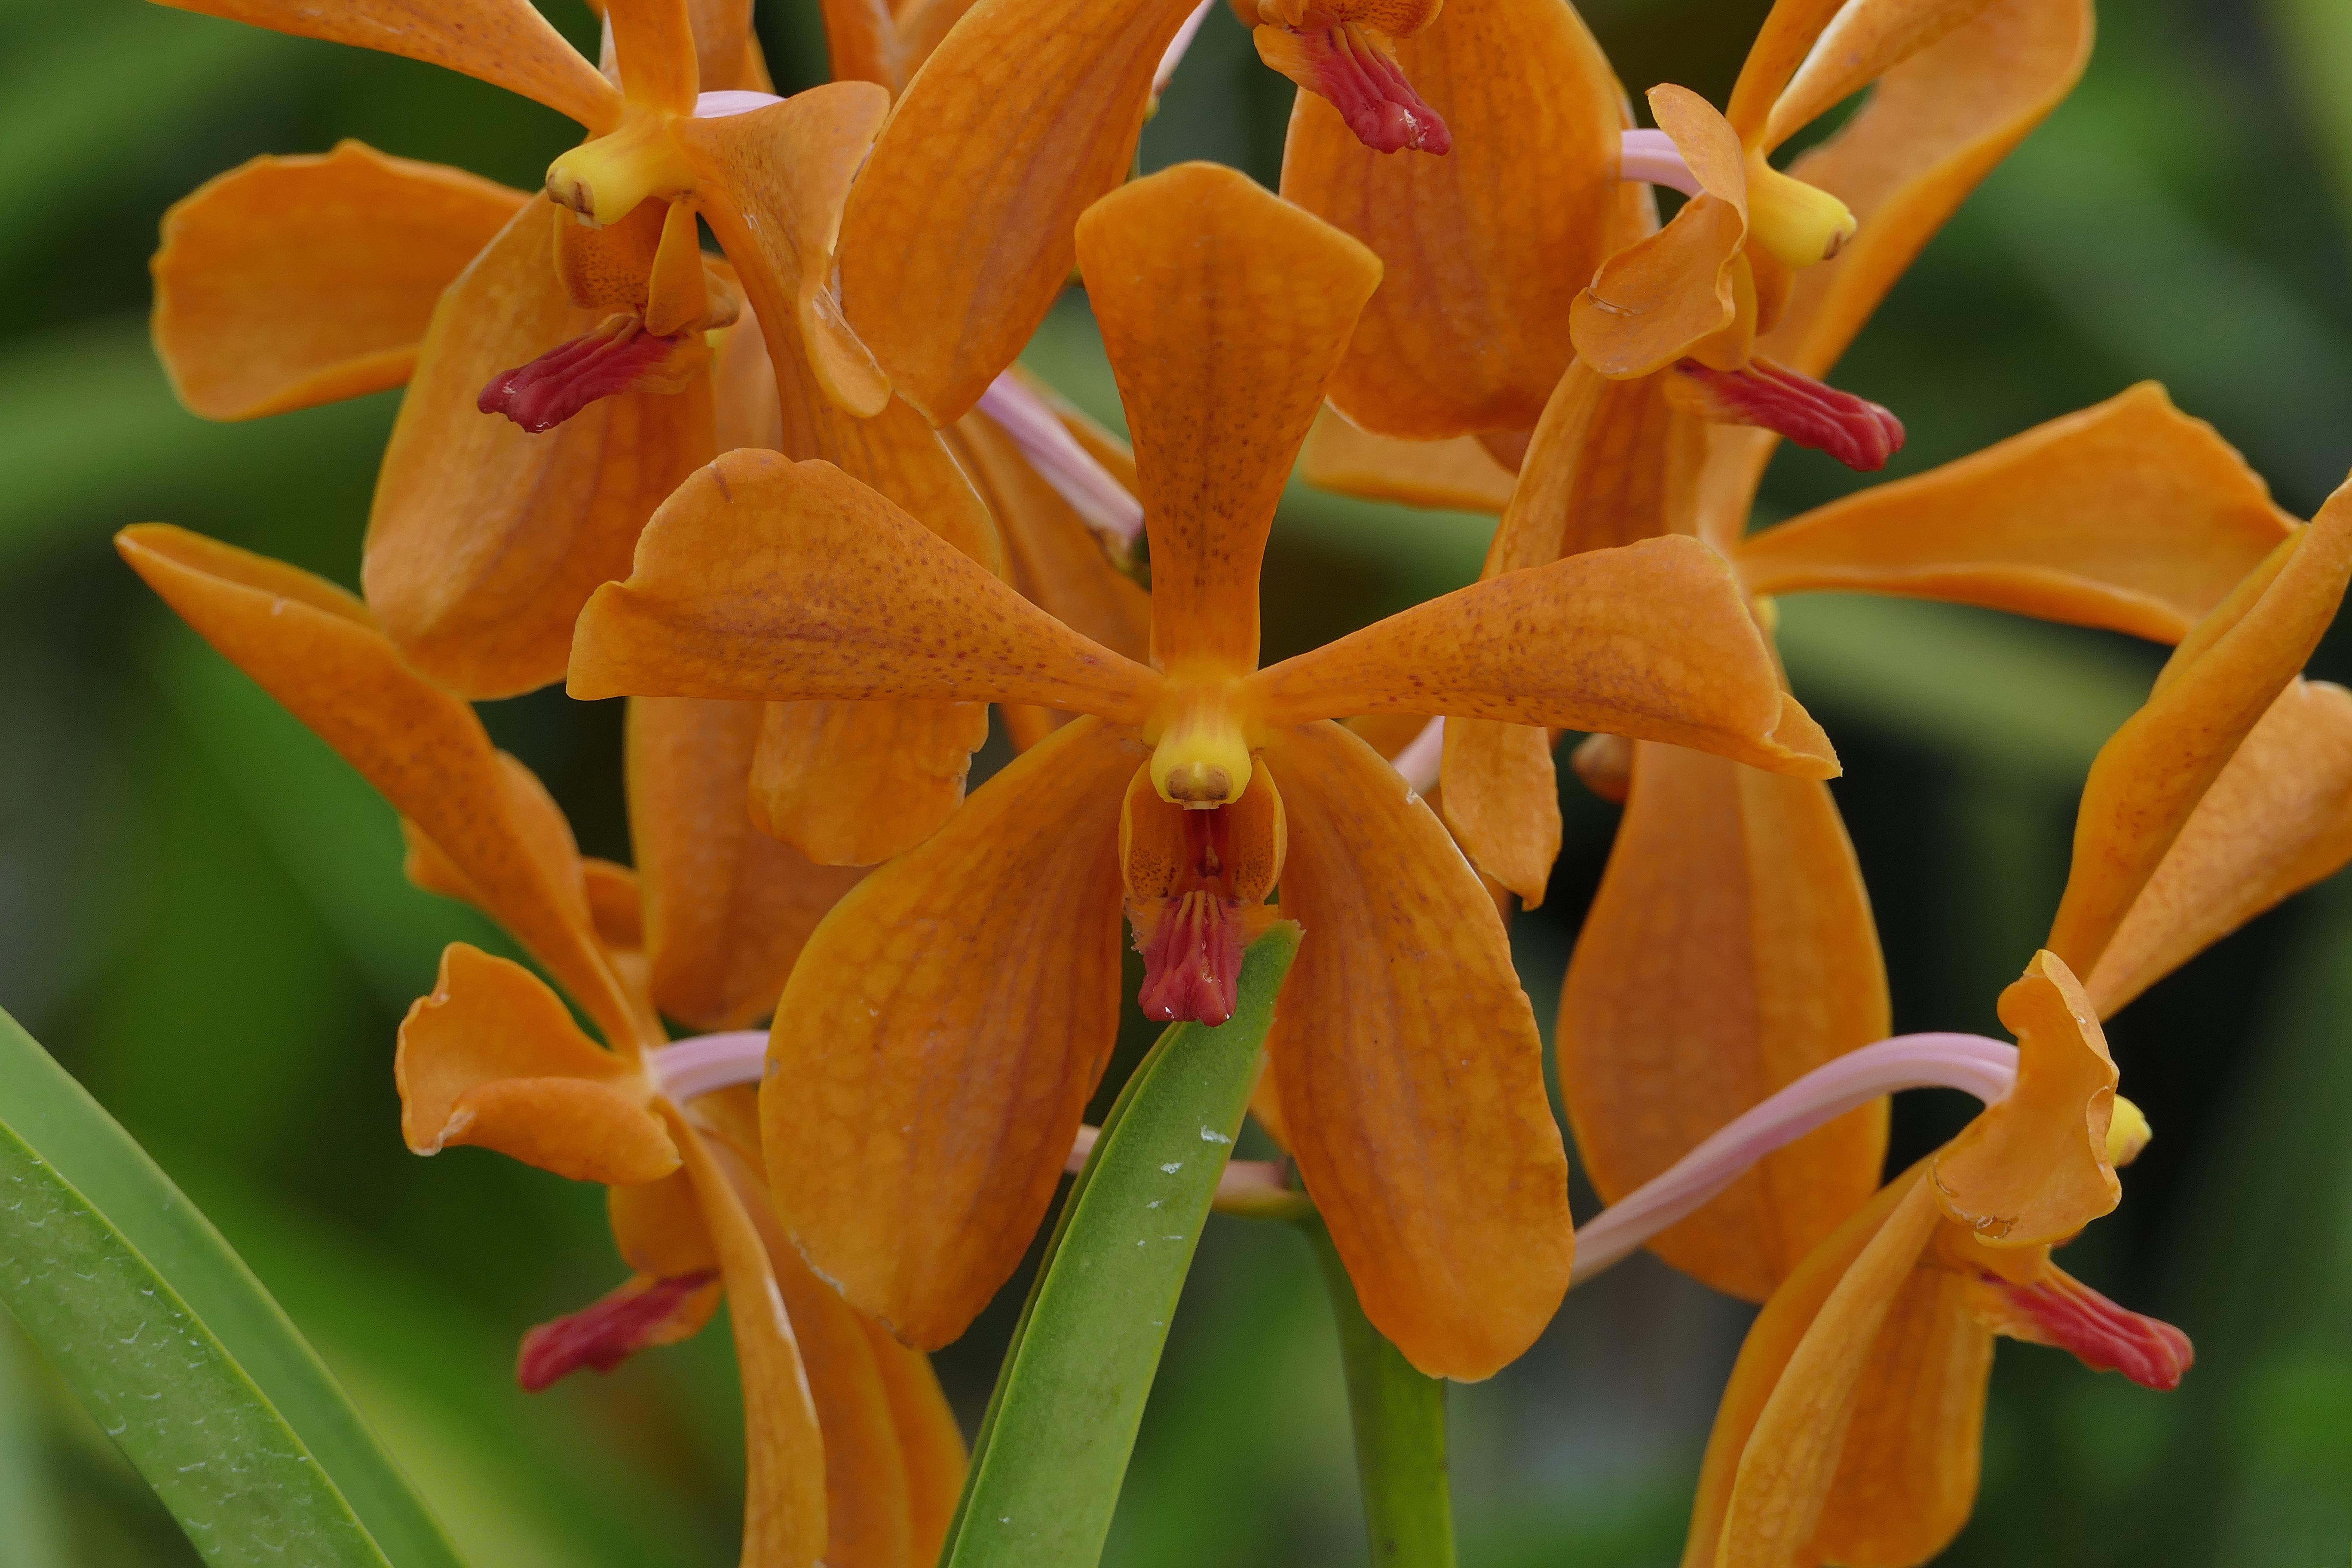 File:Orchid in Golden Garden 3.jpg - Wikimedia Commons